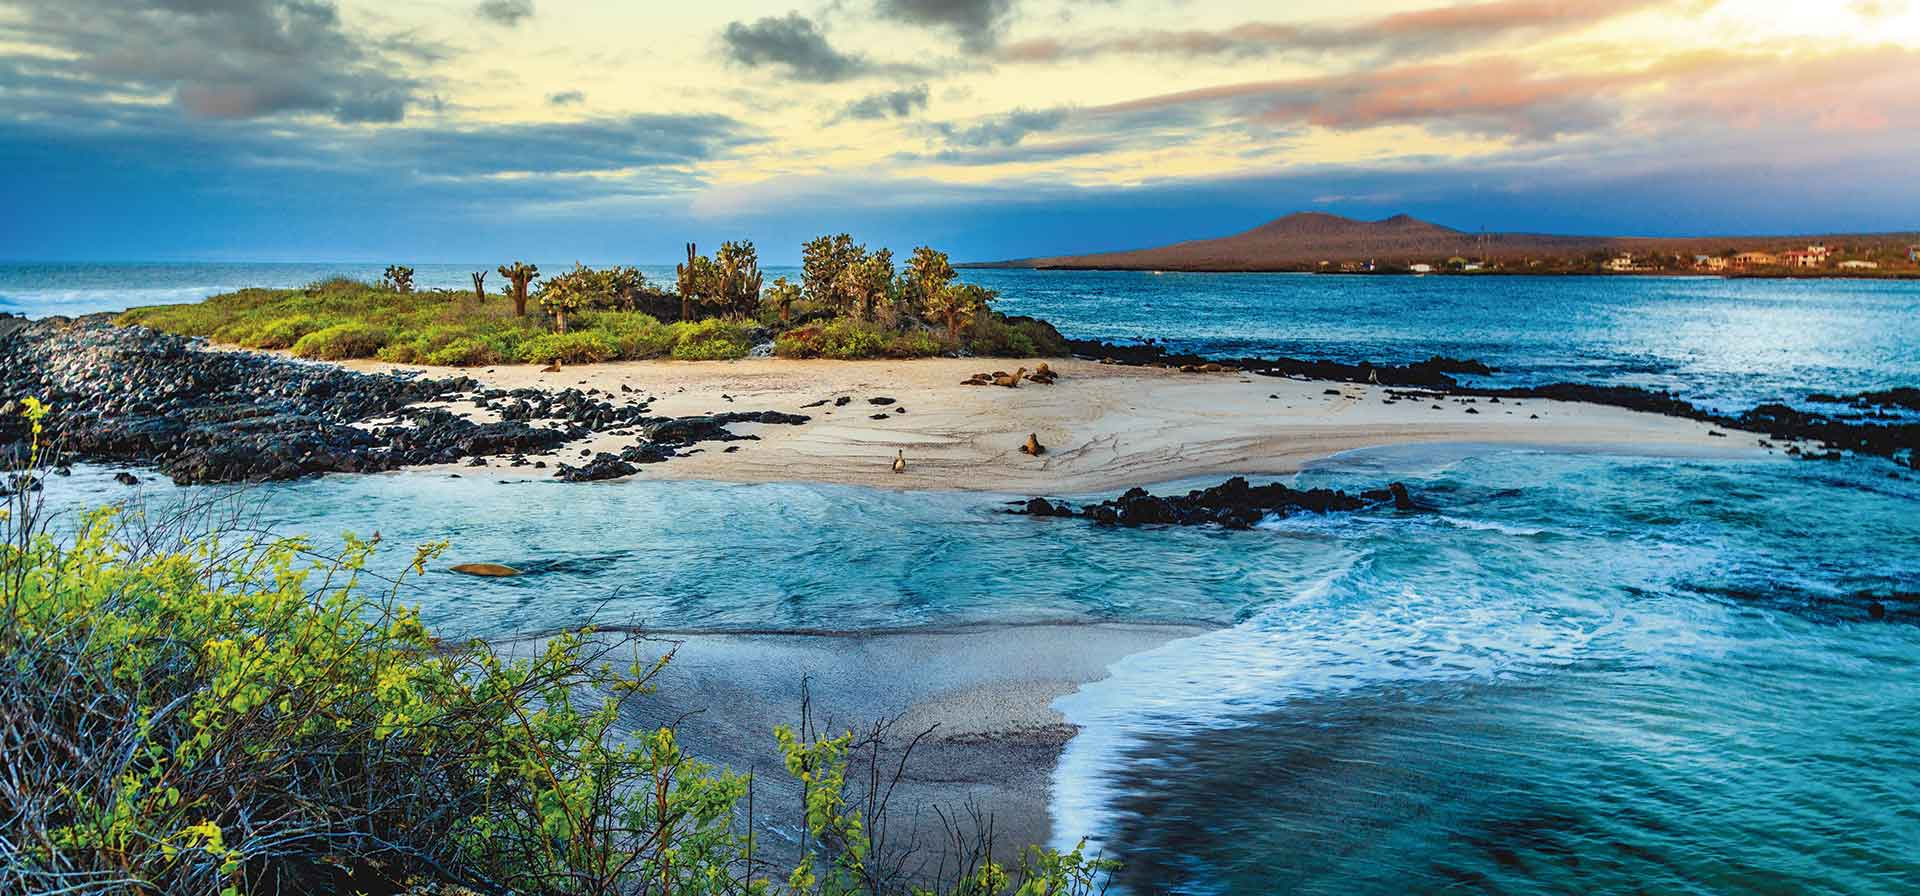 IslasGalapagosMar